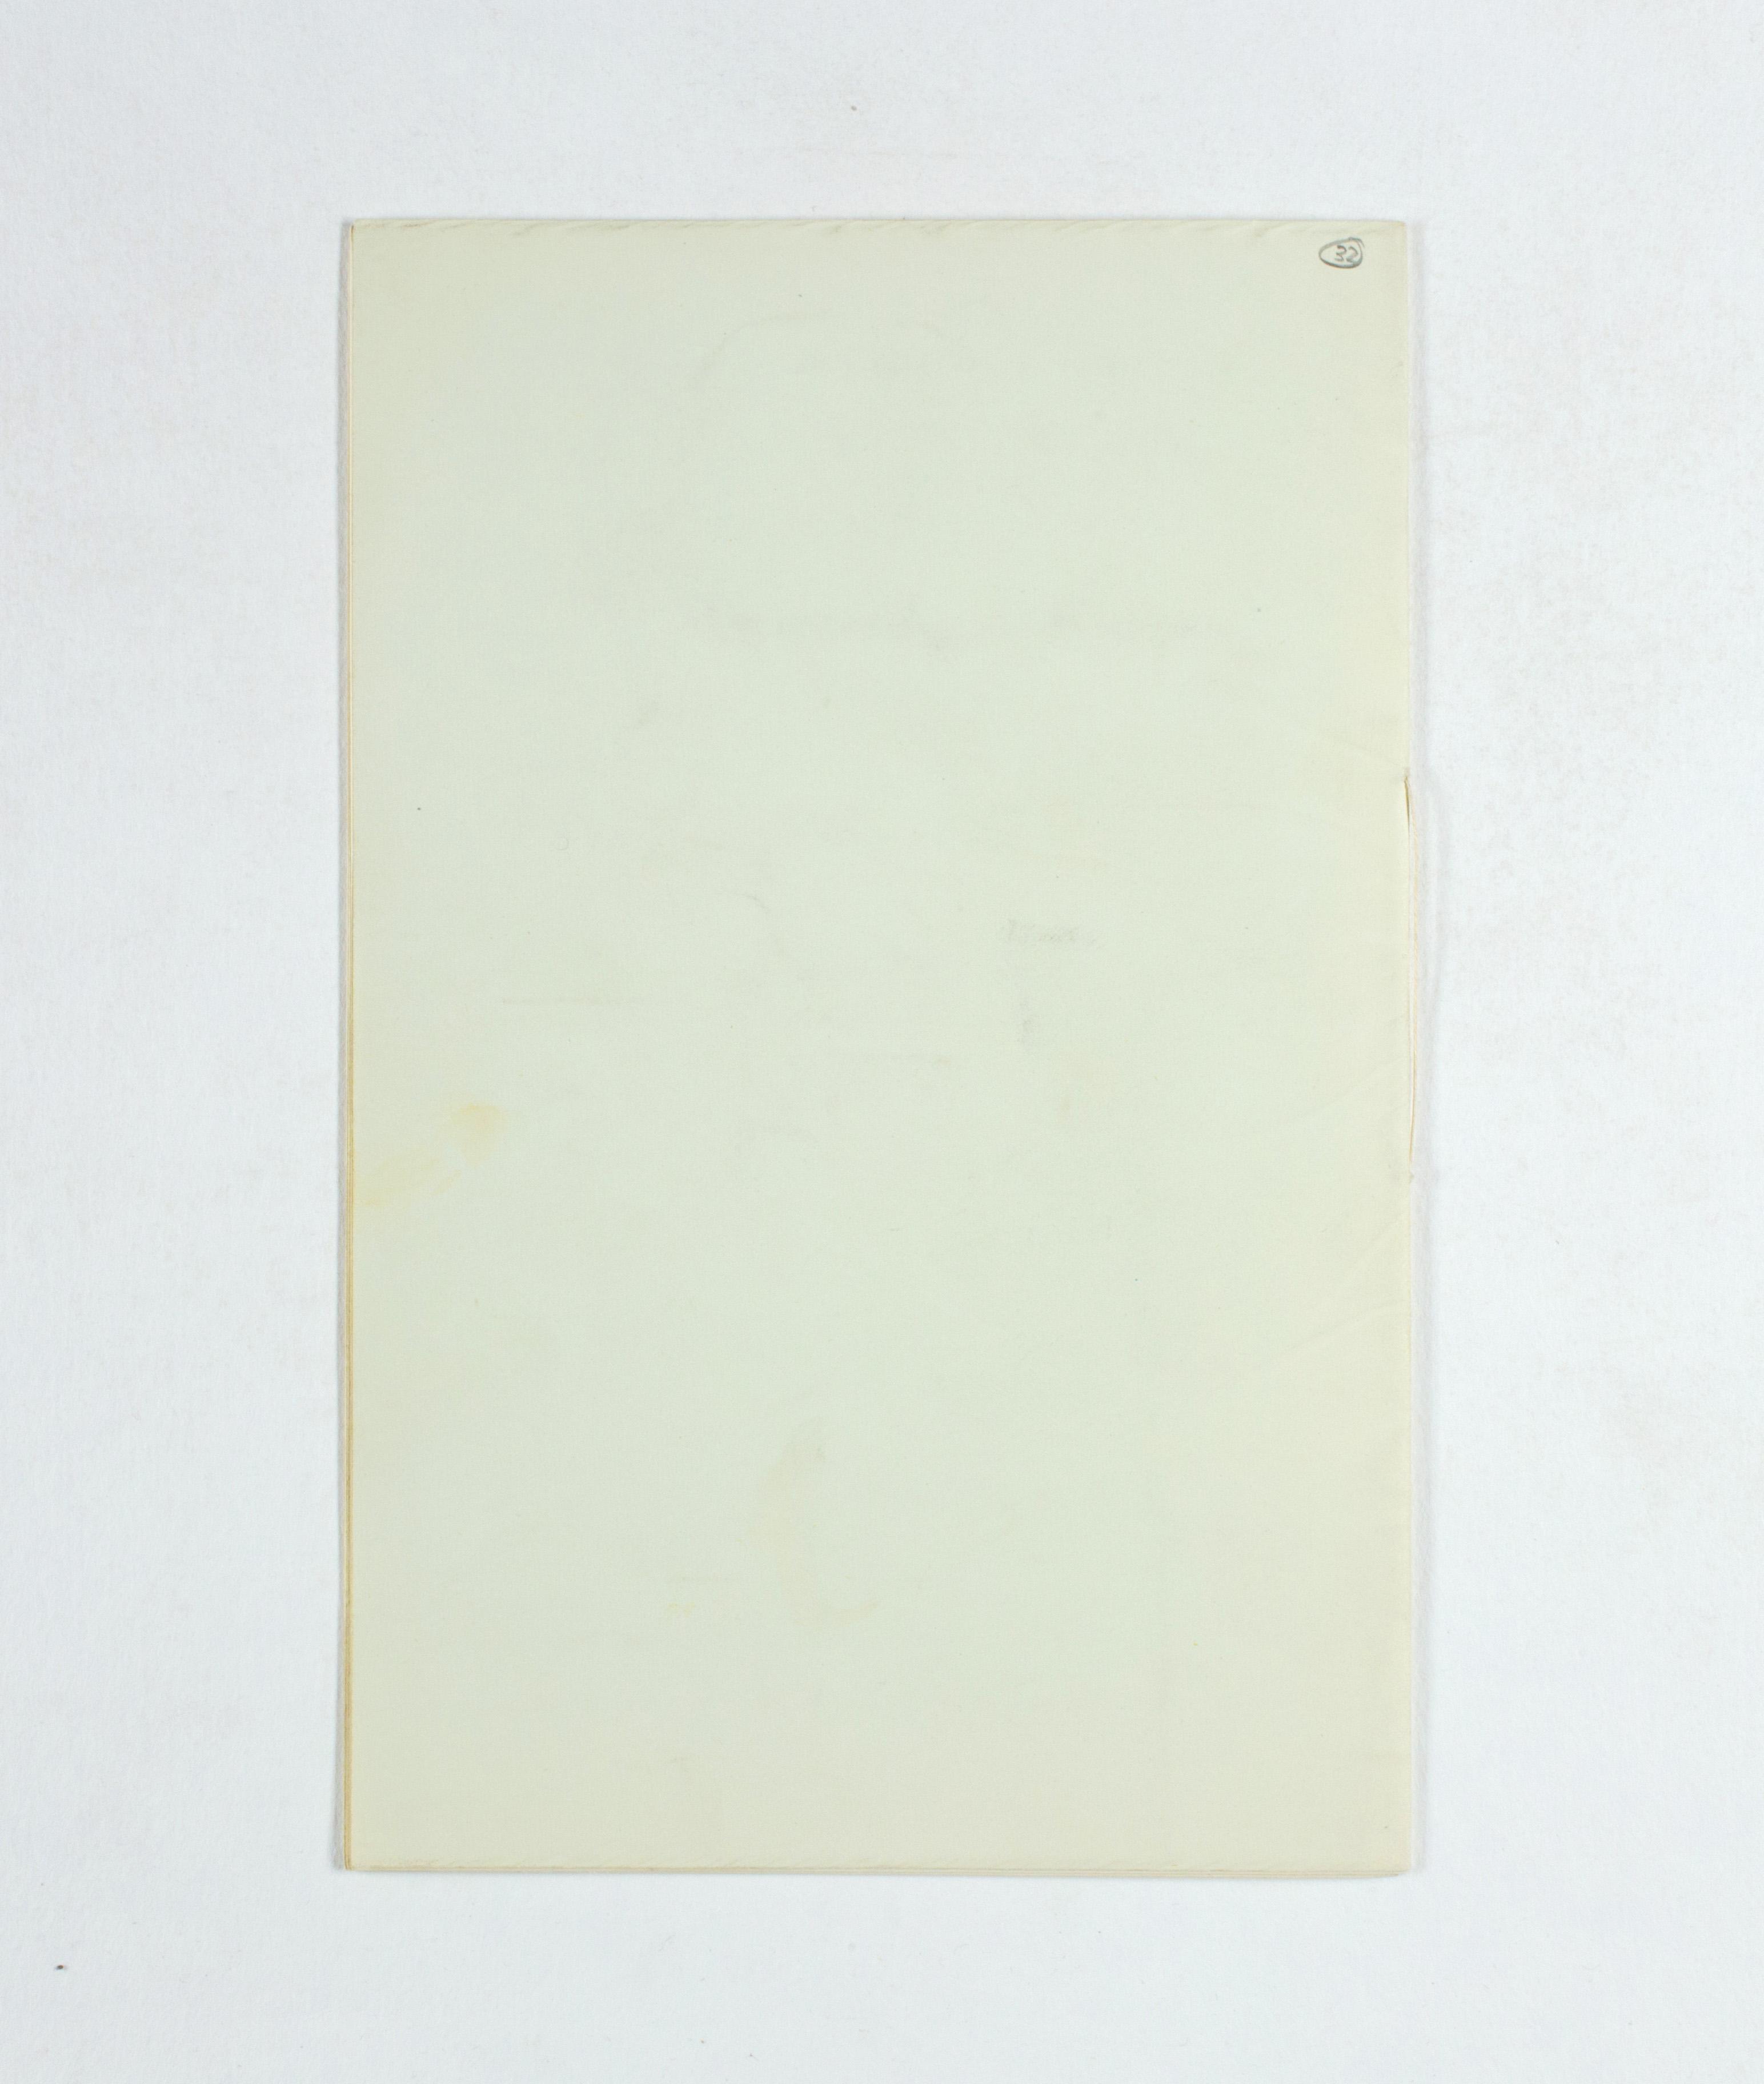 1924-25 Badari, Faiyum Exhibition catalogue PMA/WFP1/D/28/32.9